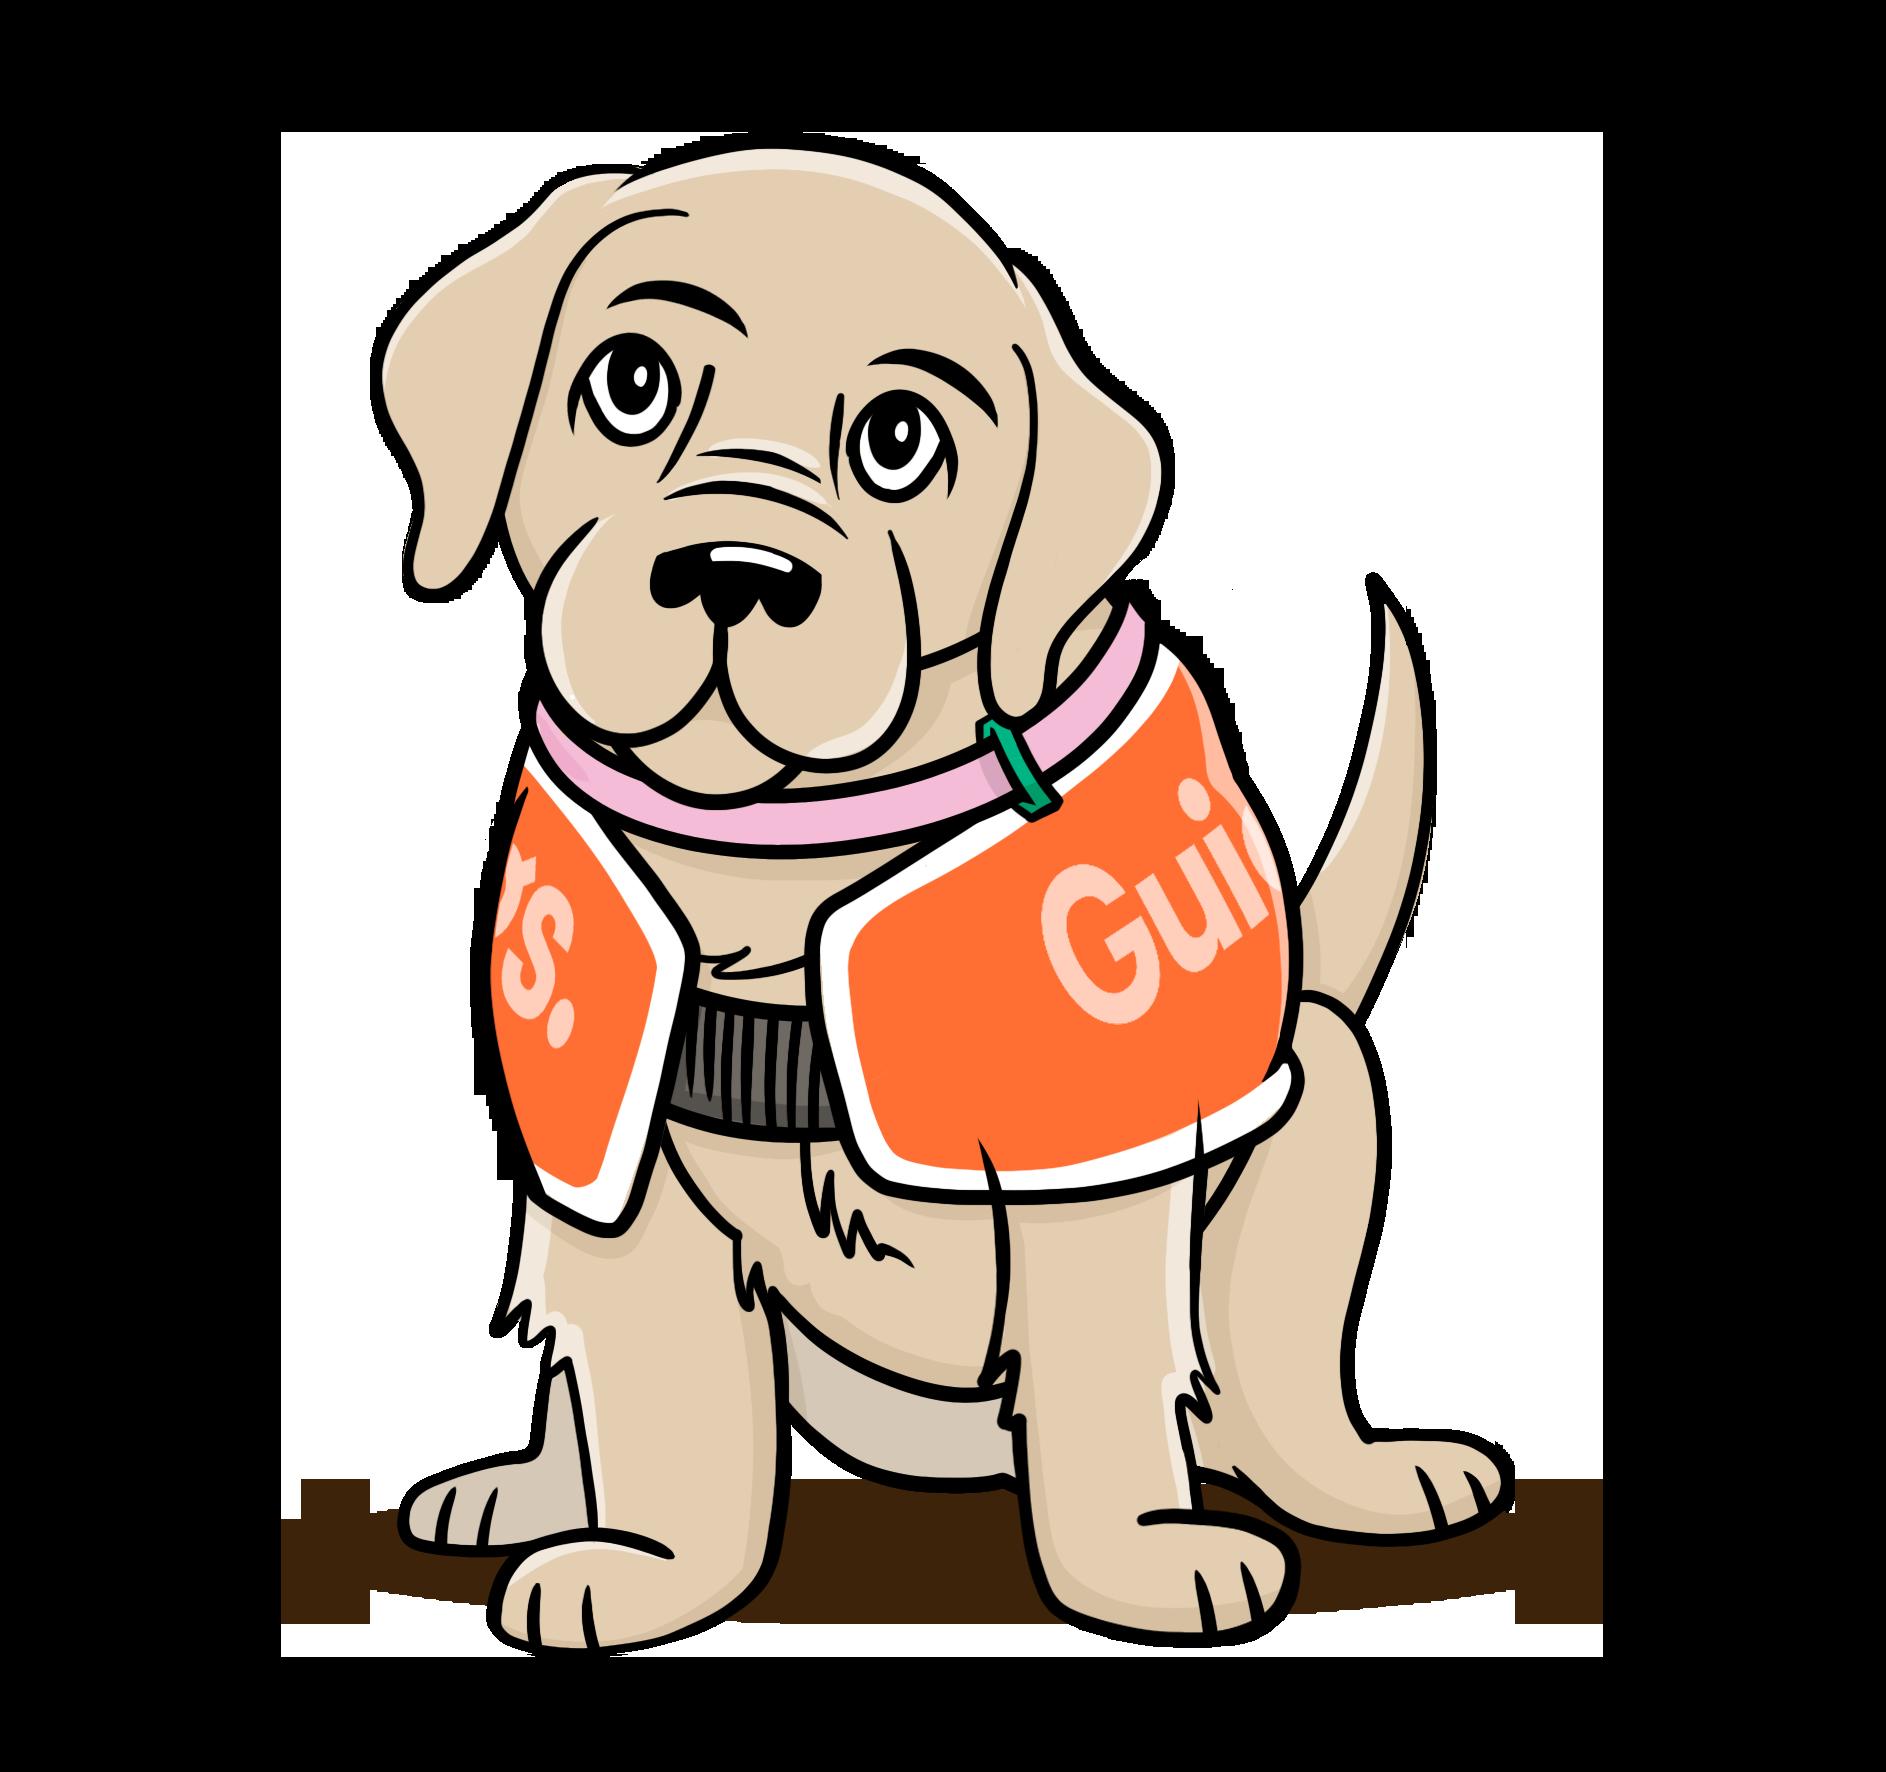 Cartoon drawing of Guide Dog pup wearing orange coat.